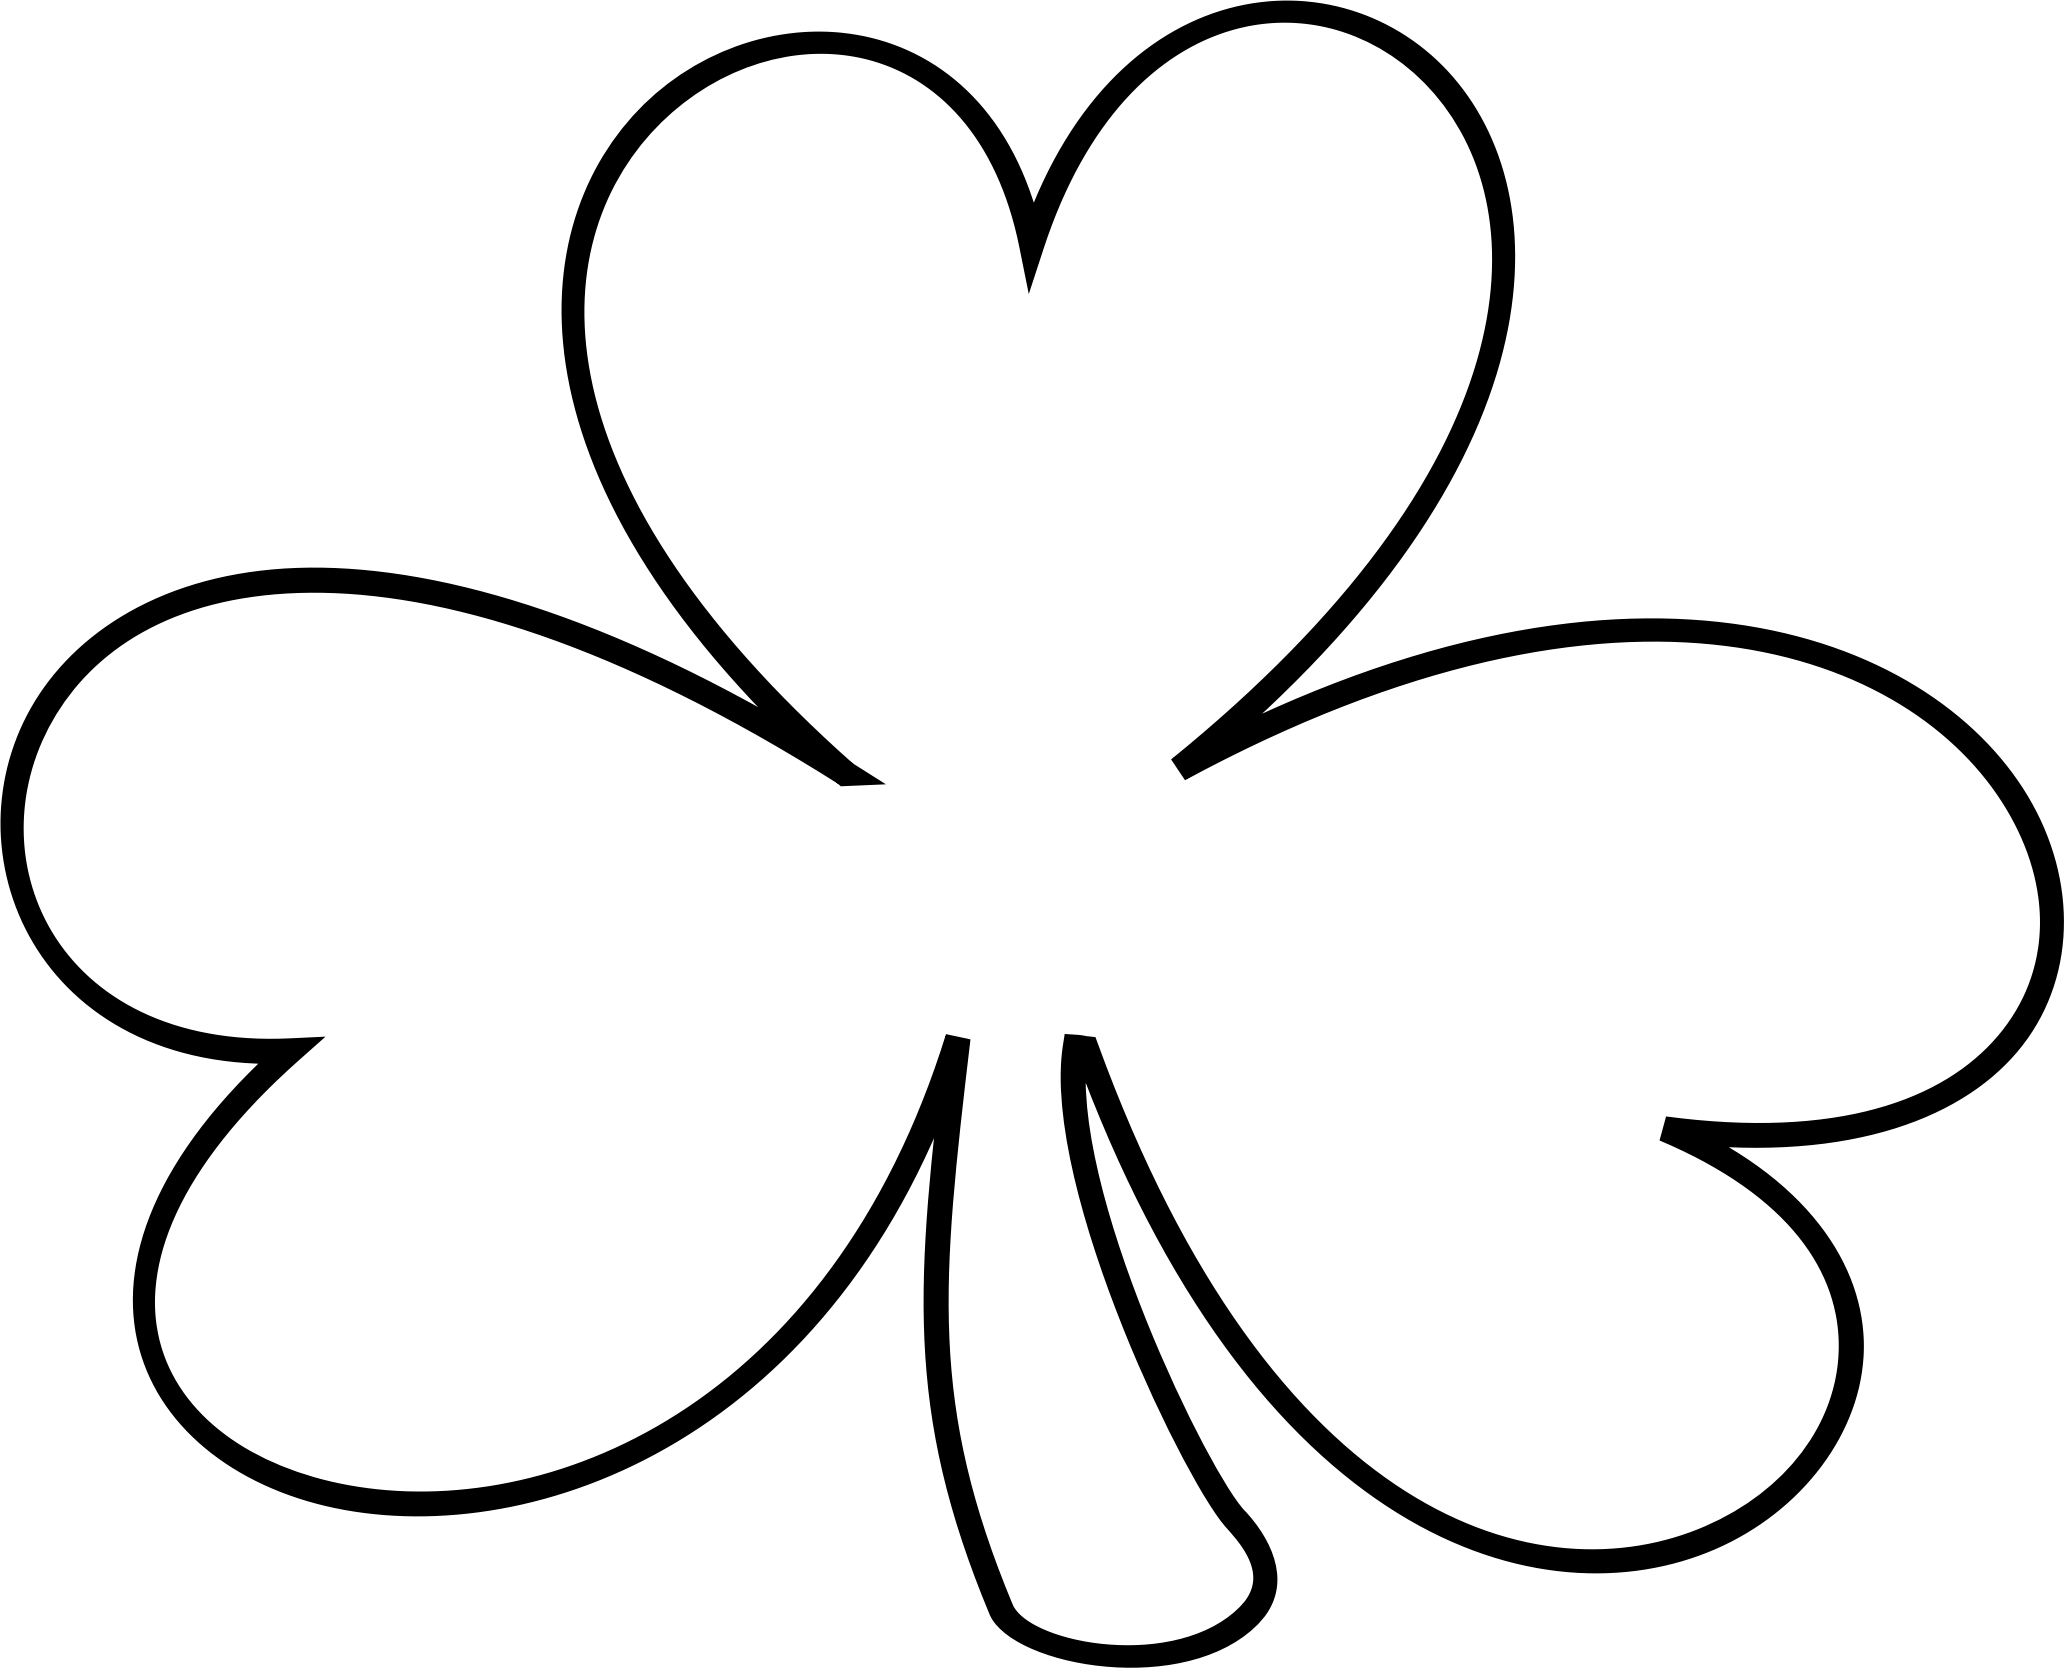 2064x1668 White Clipart Shamrock